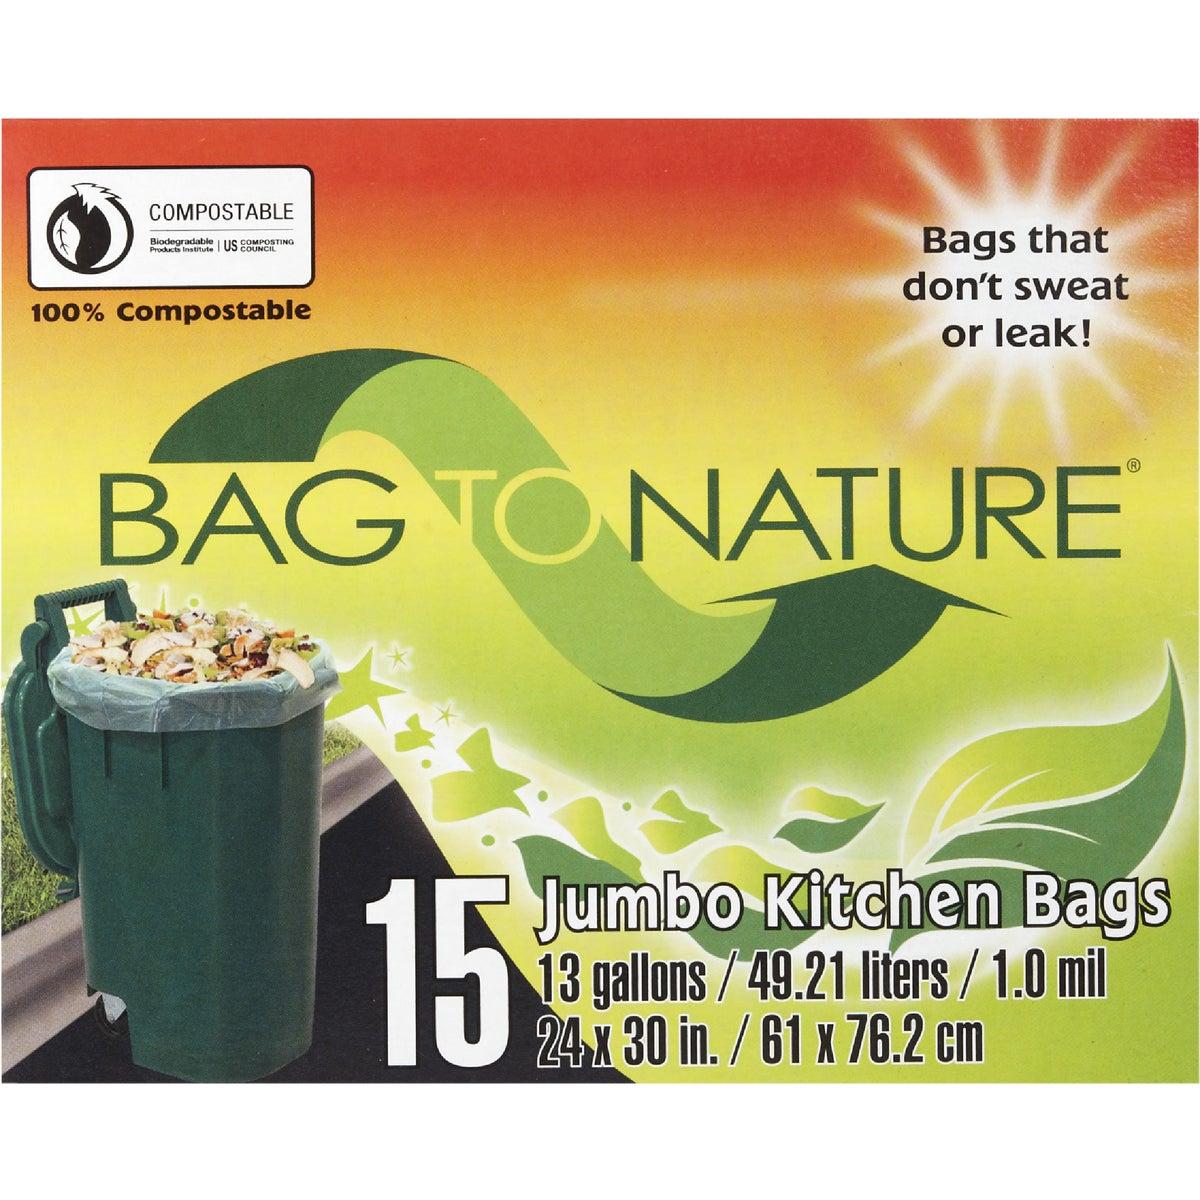 13GAL/15CT TRASH BAG - 21205 by Indaco Manufacturing